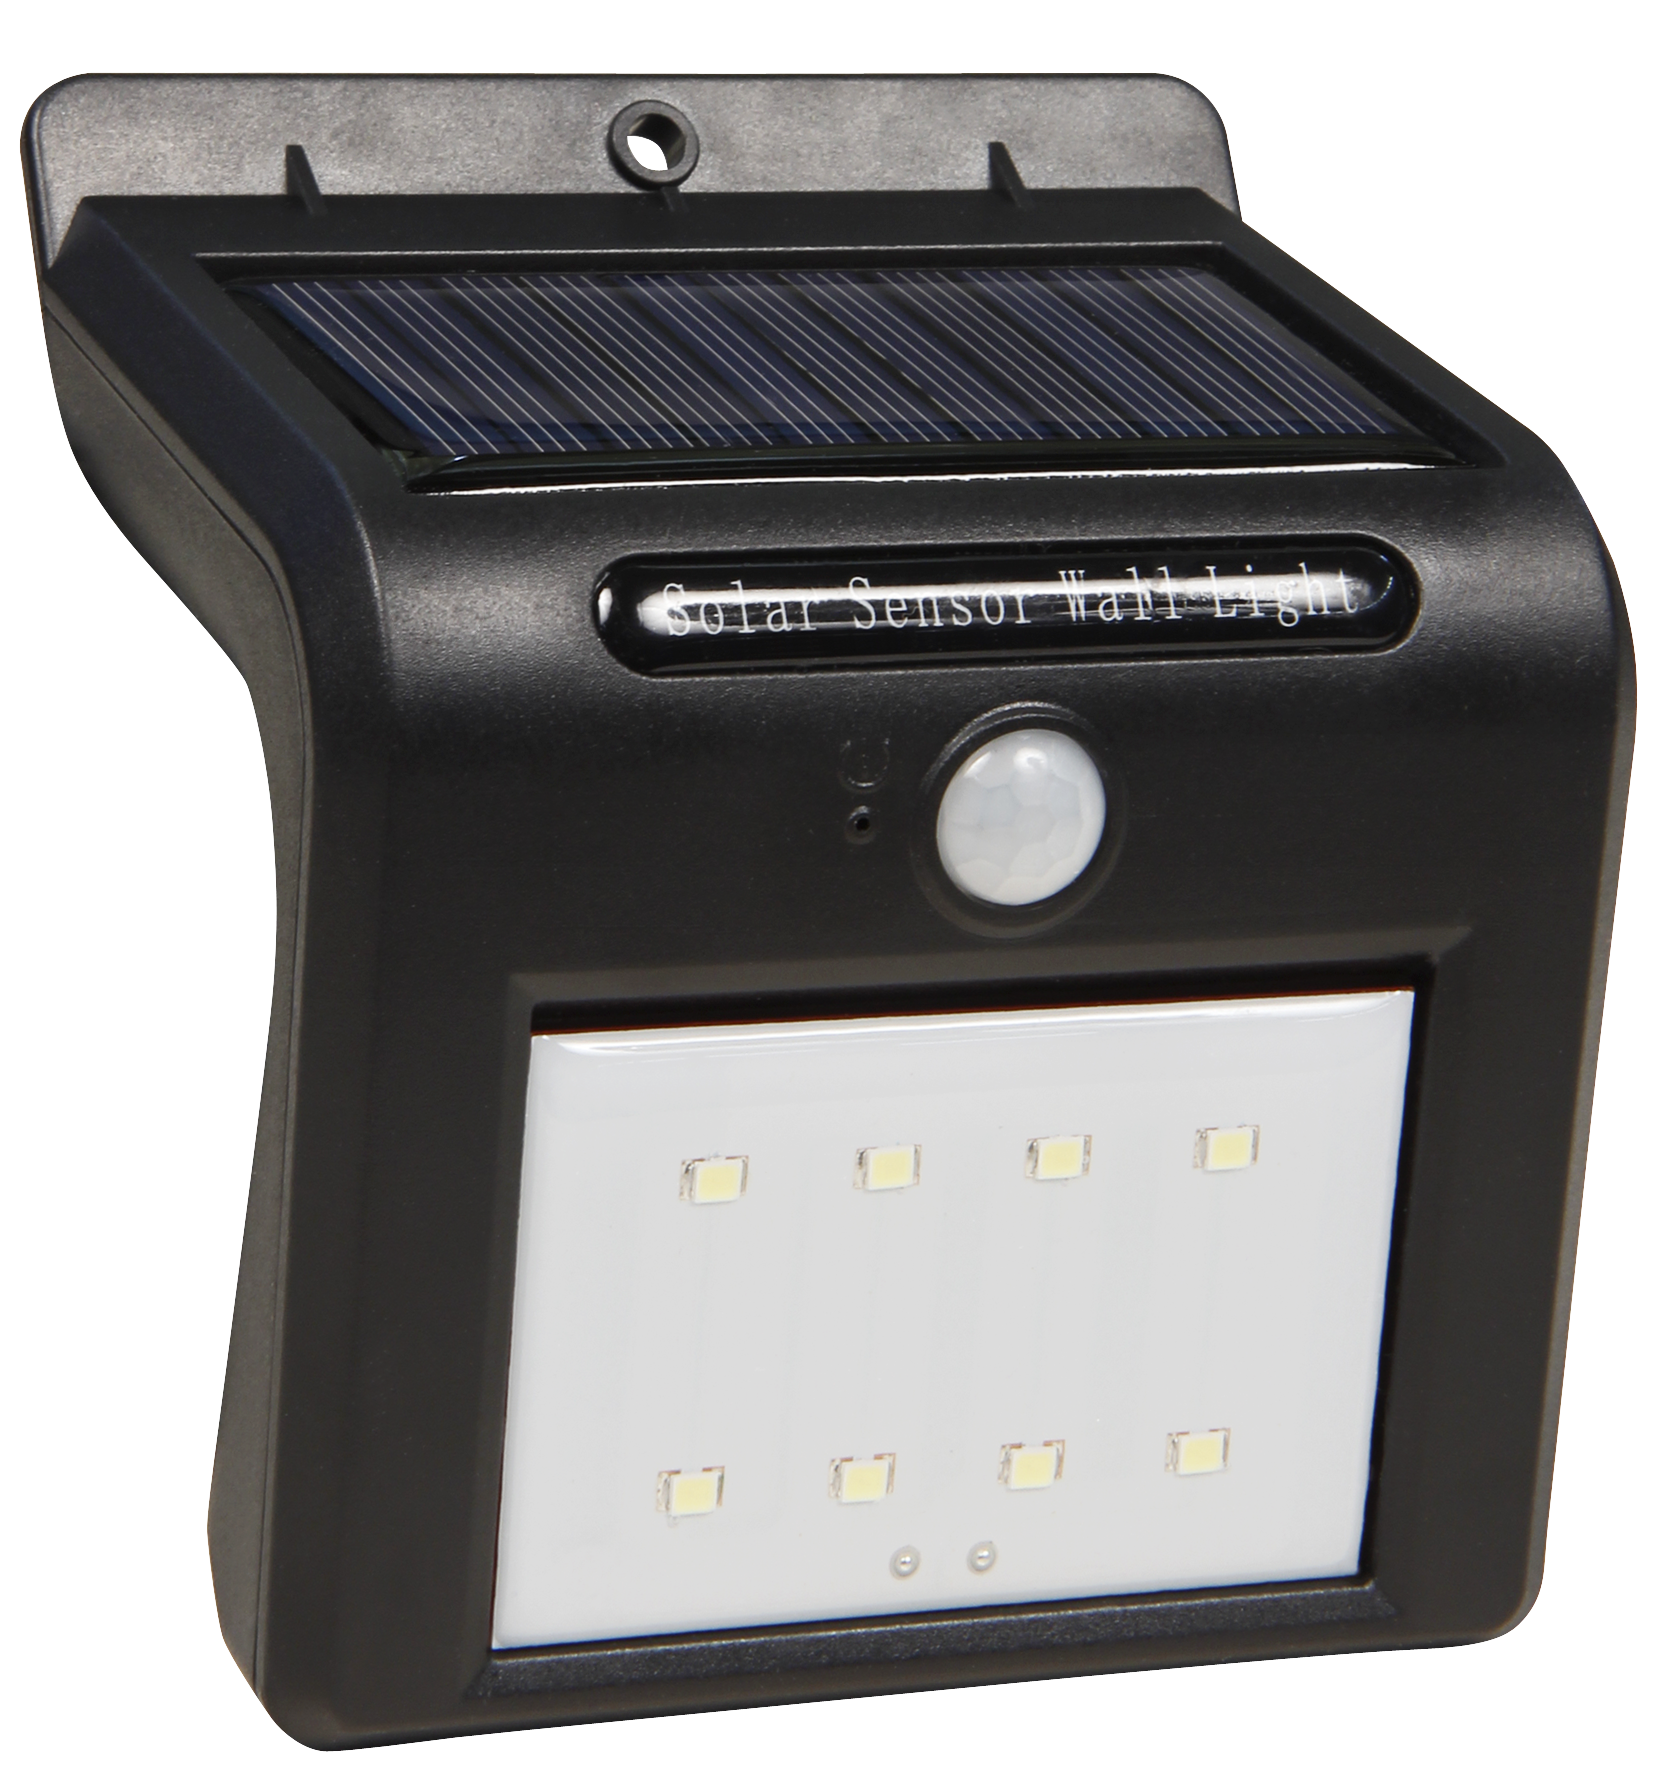 led solar wandleuchte mcshine bewegungsmelder 8leds 250lm ip65 1200ma akku ett der. Black Bedroom Furniture Sets. Home Design Ideas